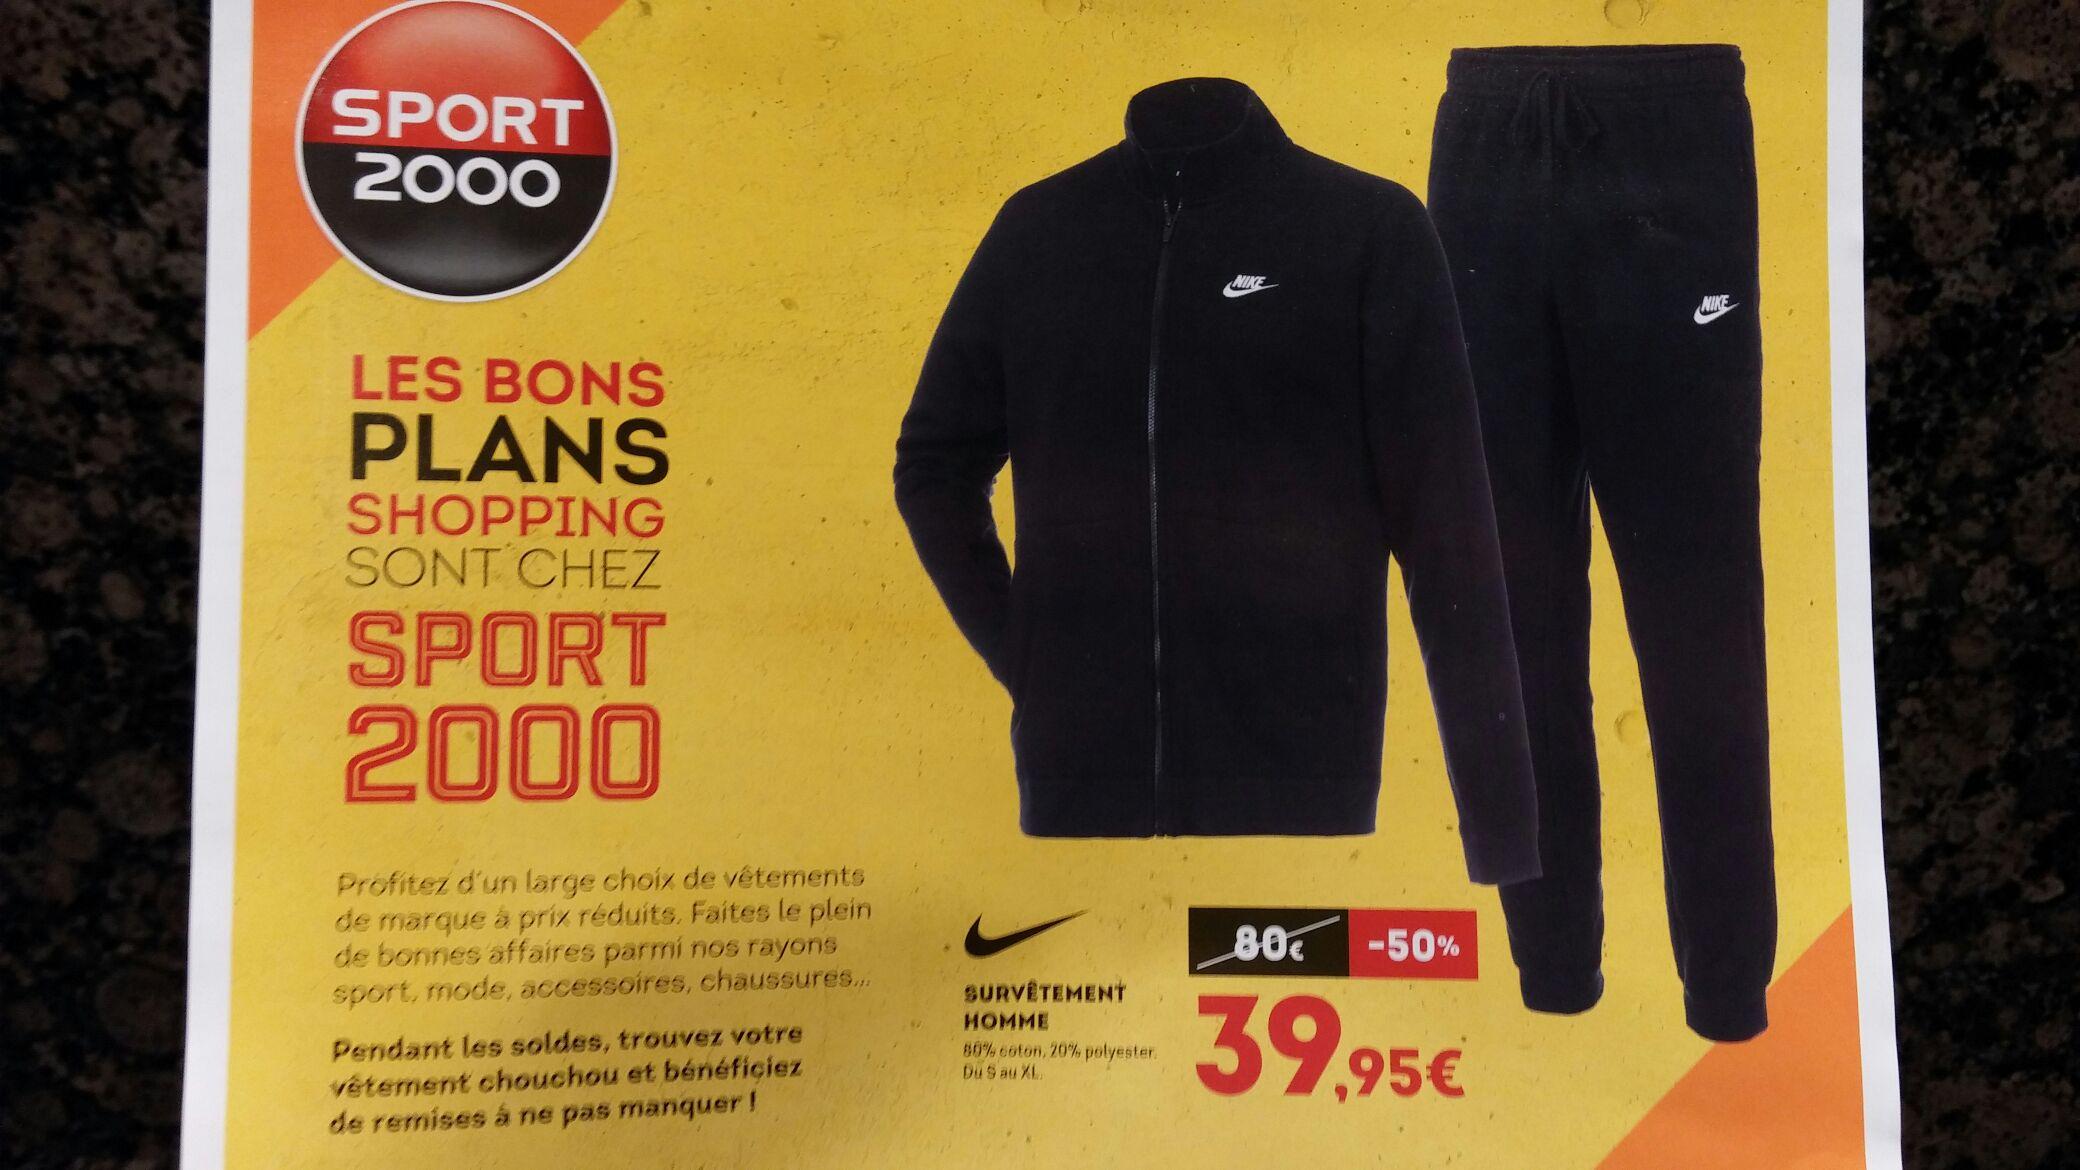 Sport Bons Bons Plans 2000 Plans Ttqd6w8